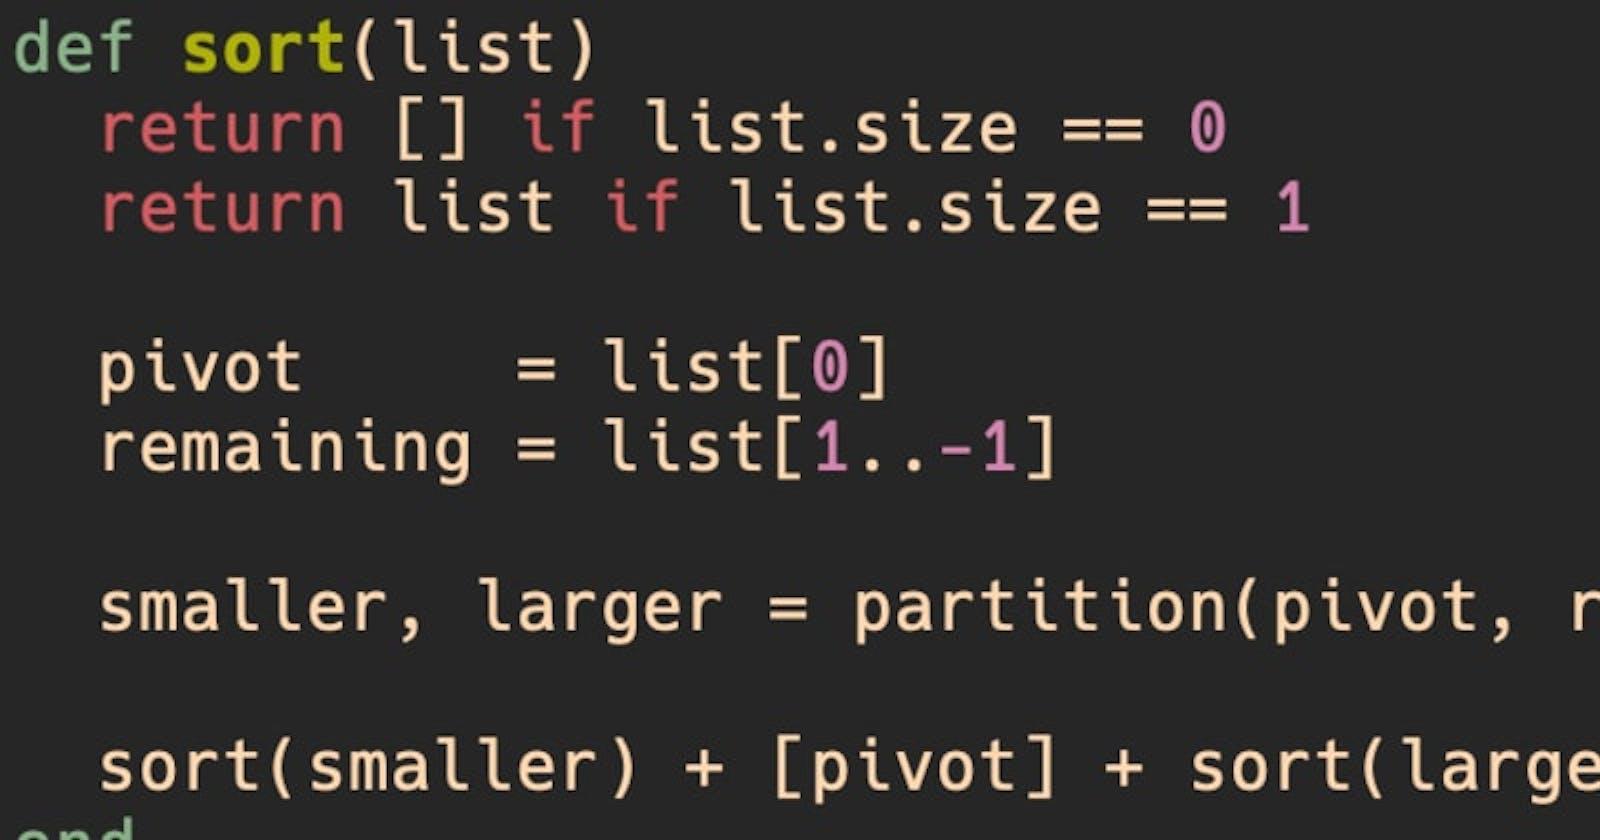 Quicksort, a Ruby implementation using Test-driven development